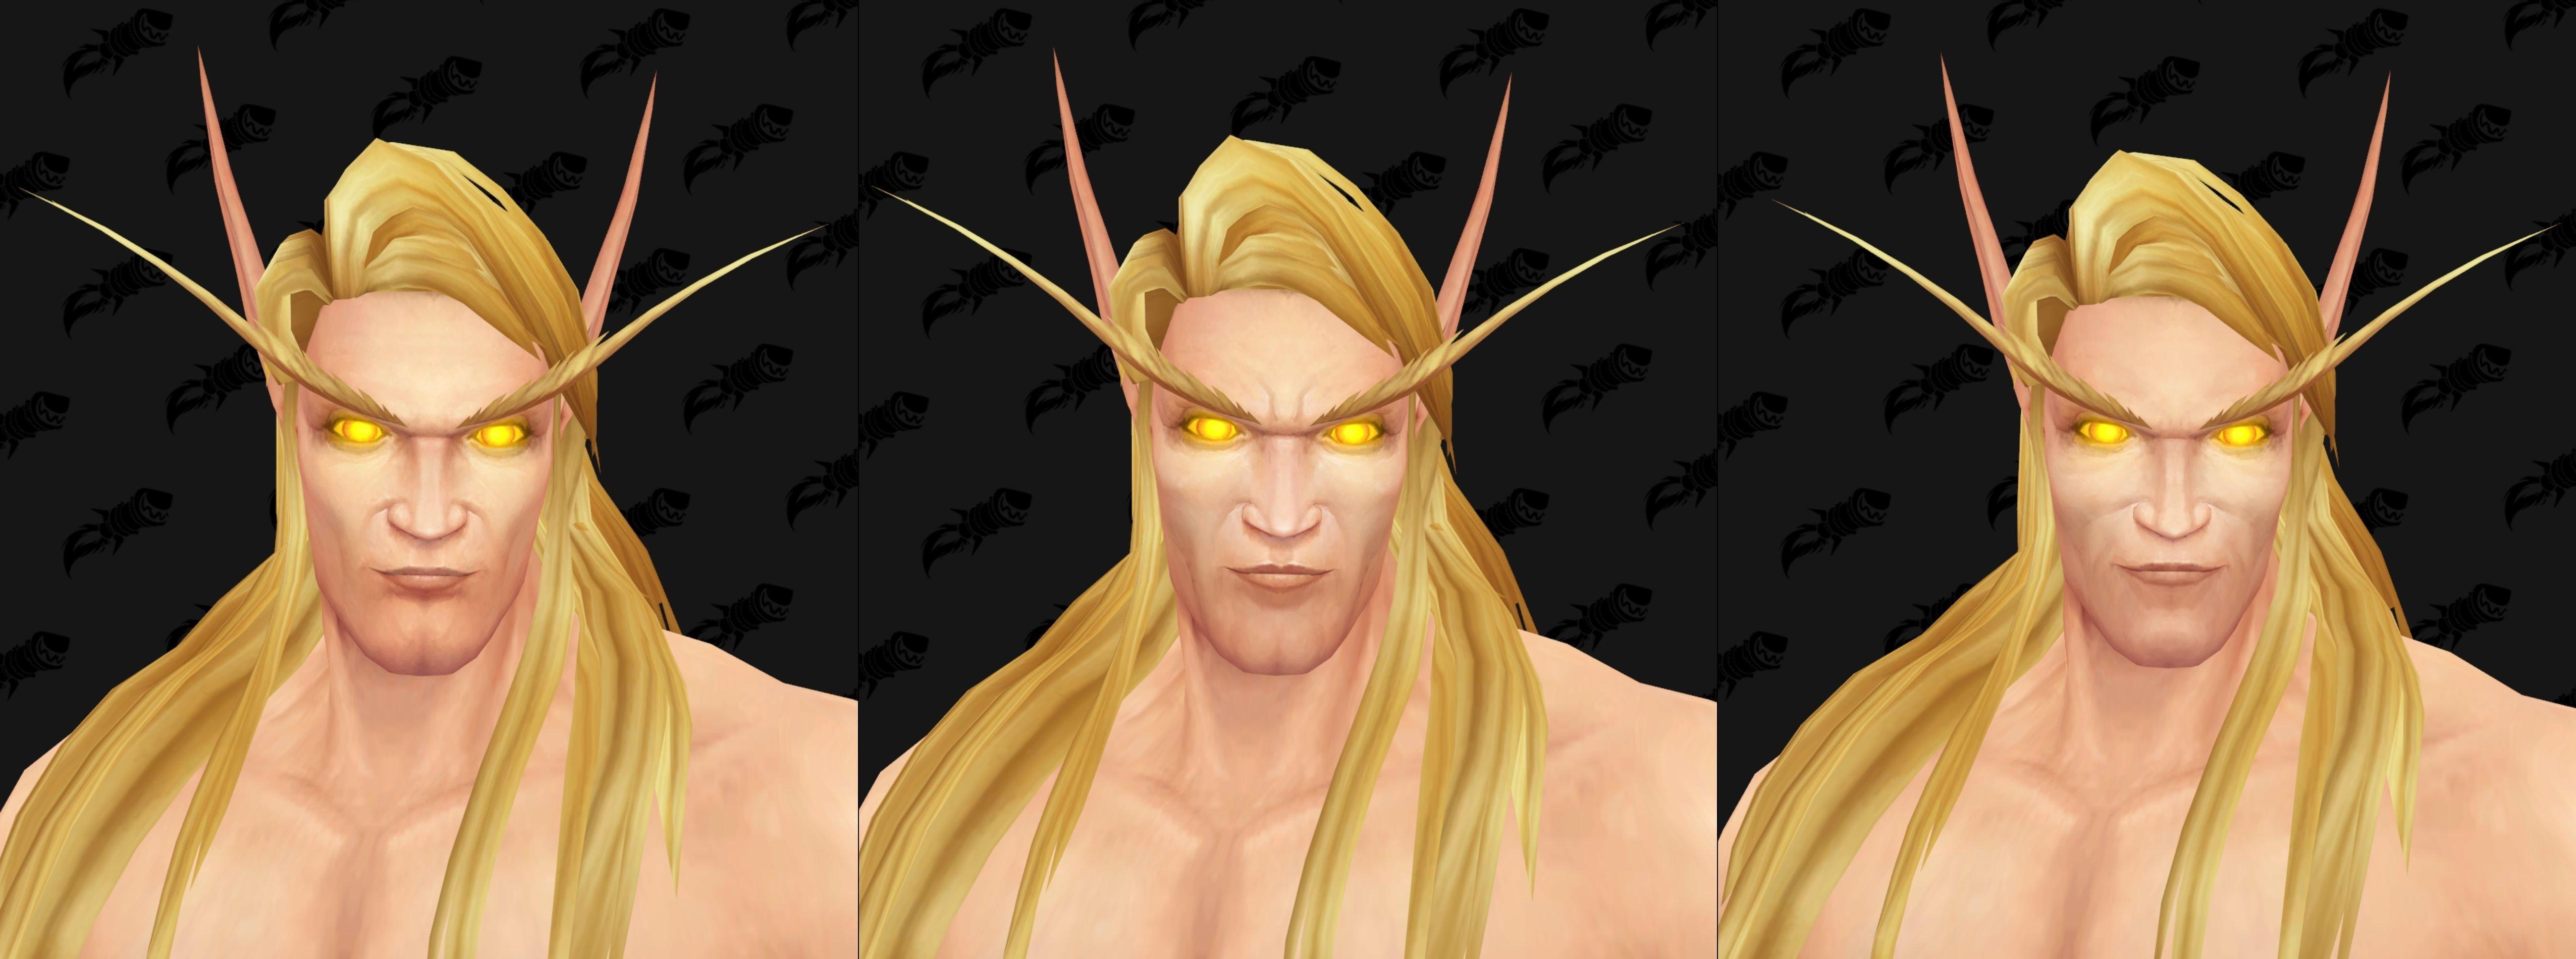 WoW Blood Elf Golden Eyes Male